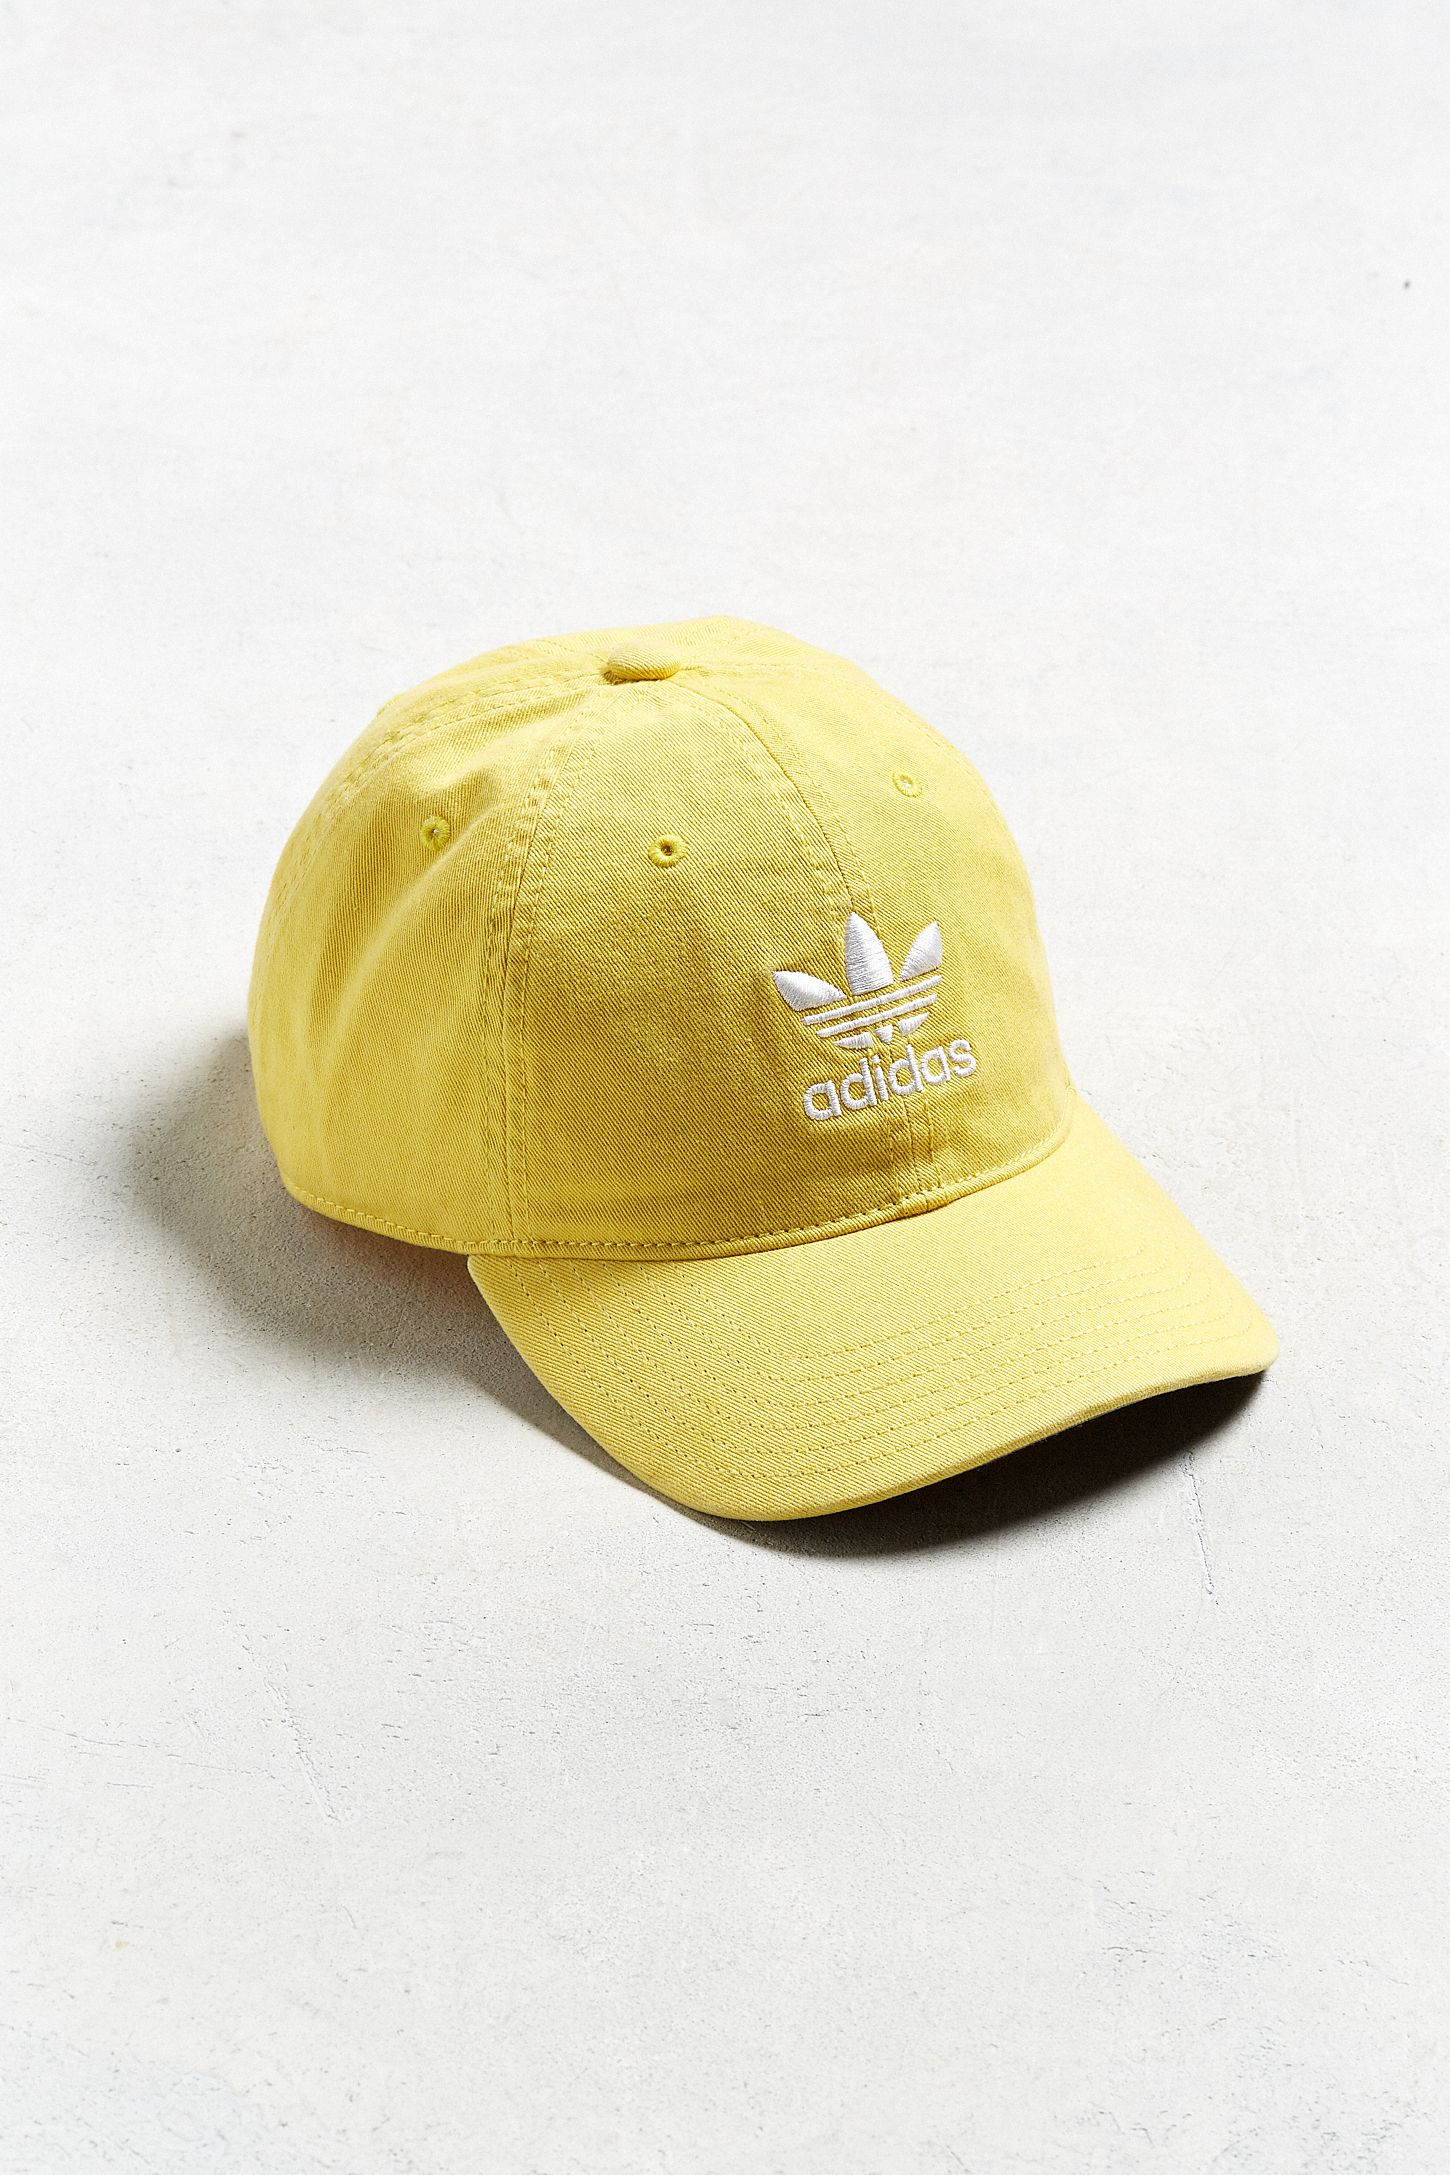 adidas Originals Relaxed Yellow Baseball Hat  706ea3e0366